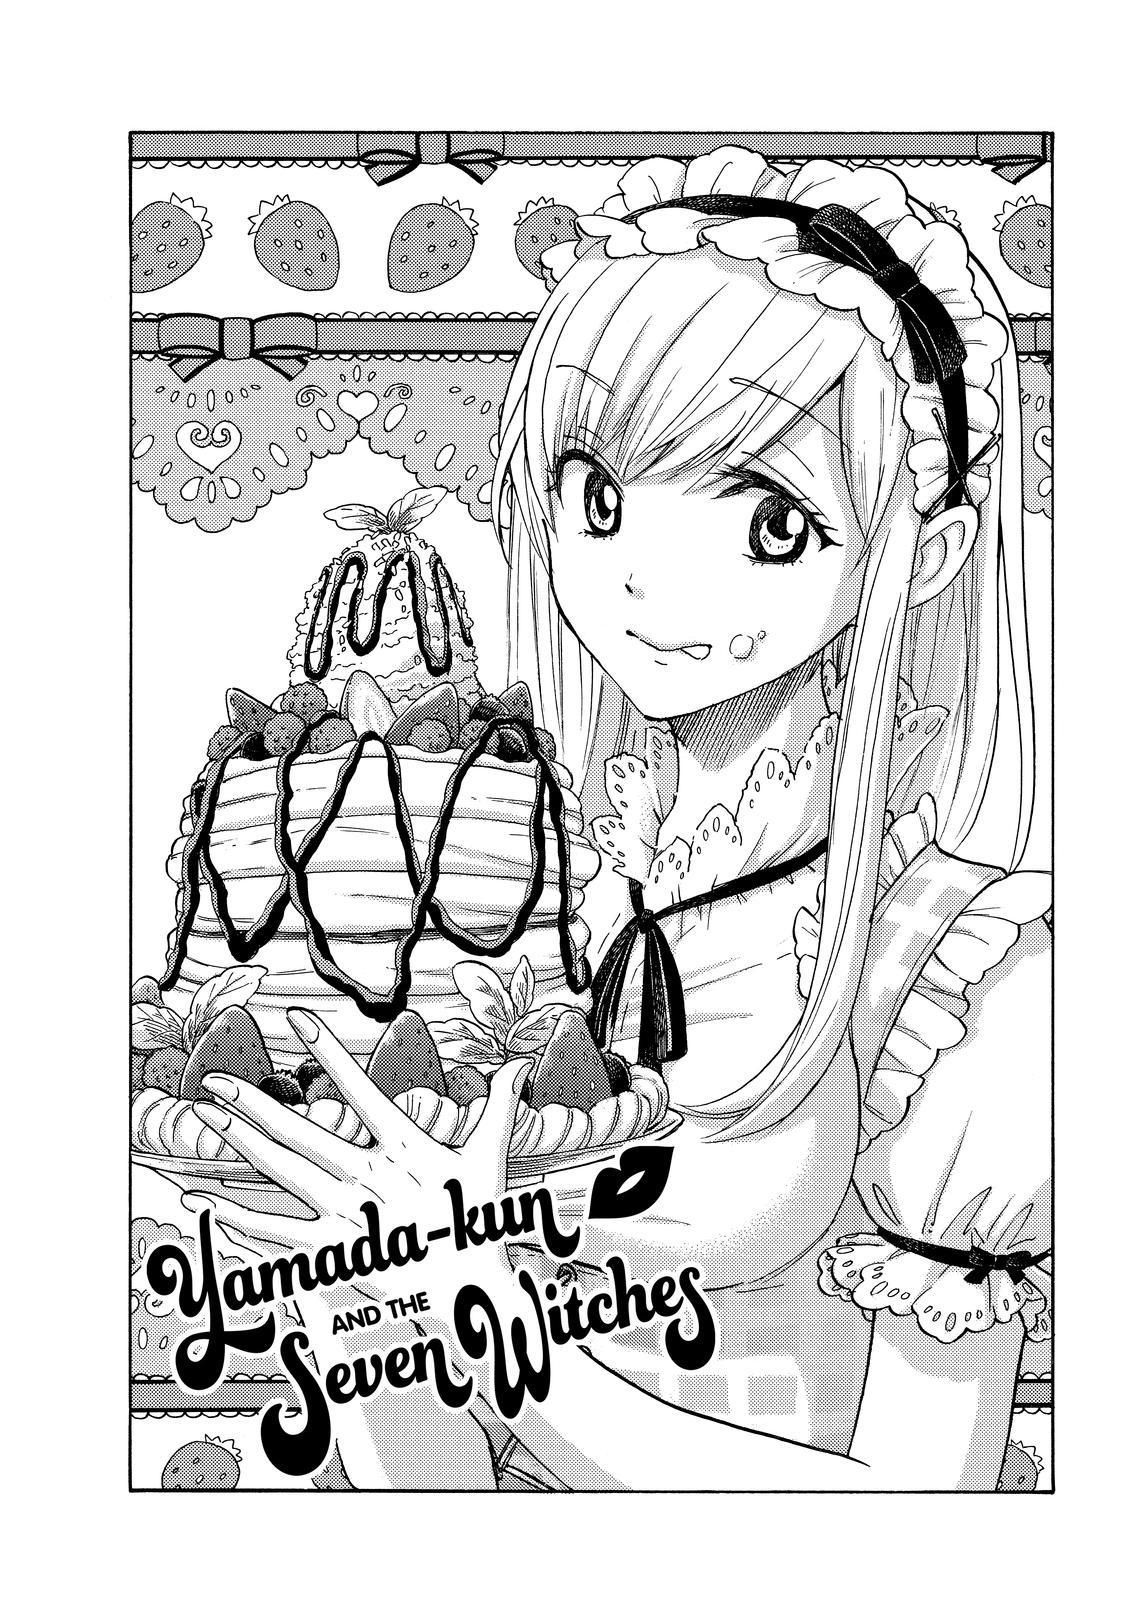 Yamada-kun to Nananin no Majo - MANGA - Lector - TuMangaOnline